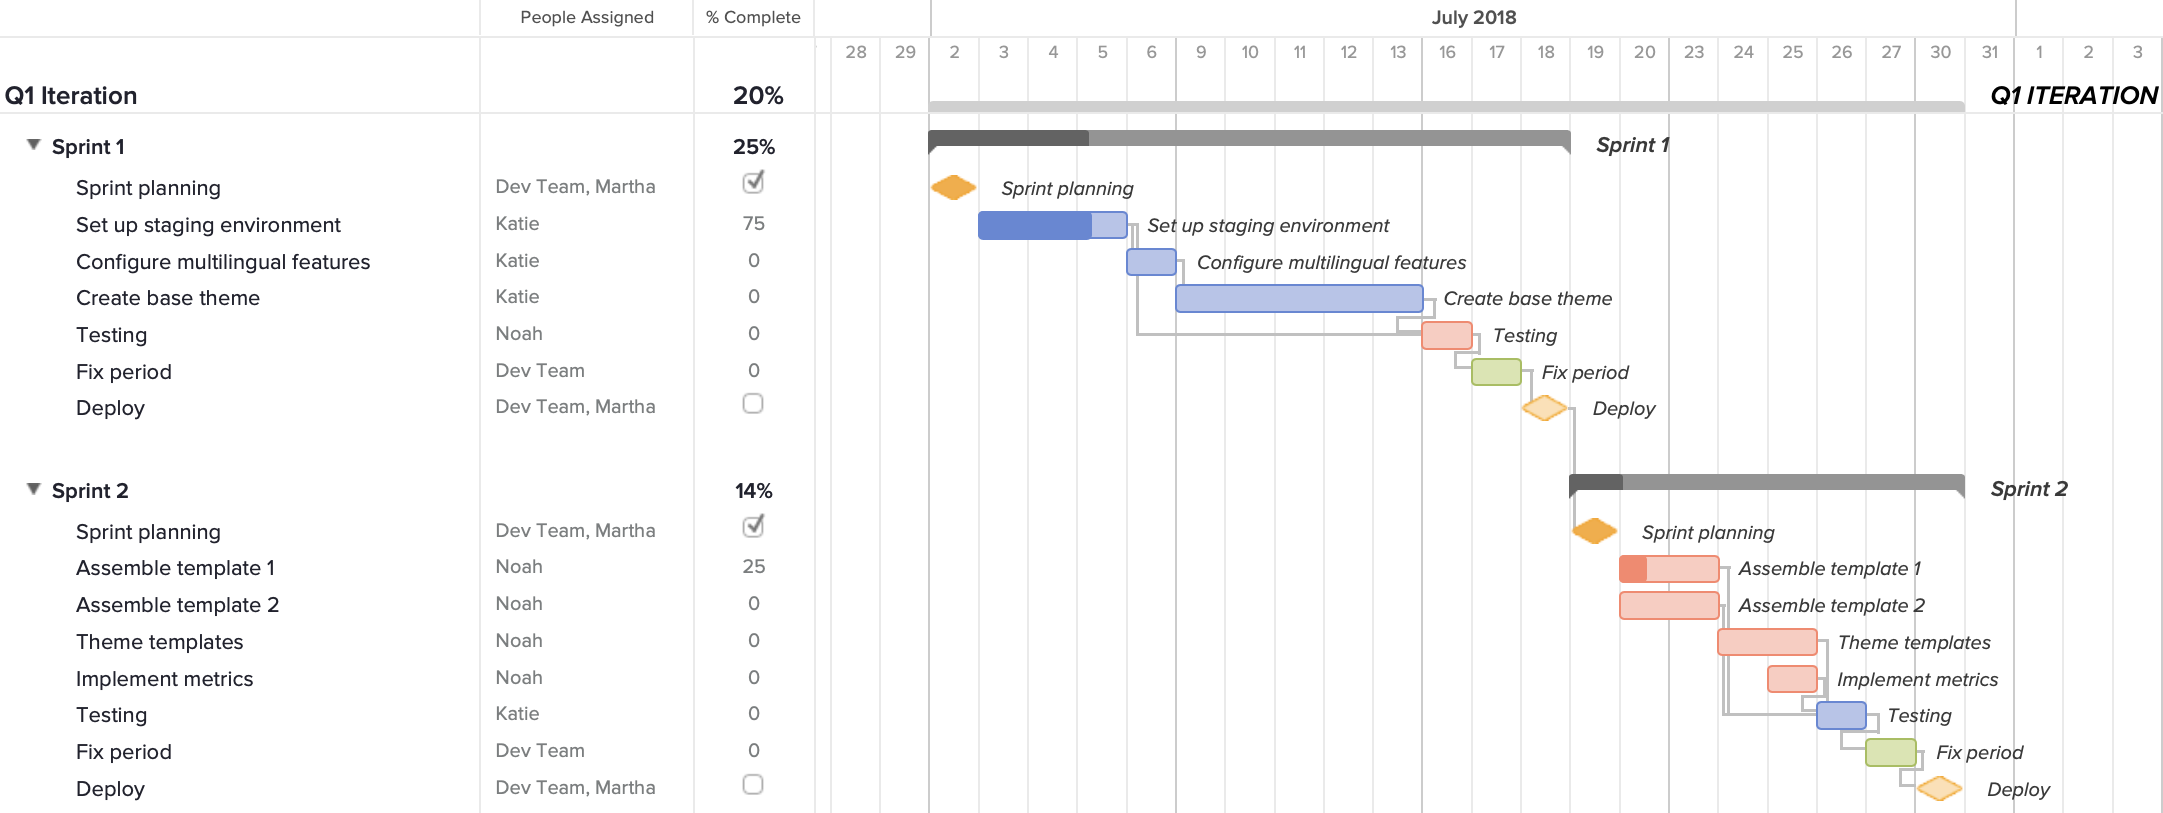 agile sprint gantt chart example